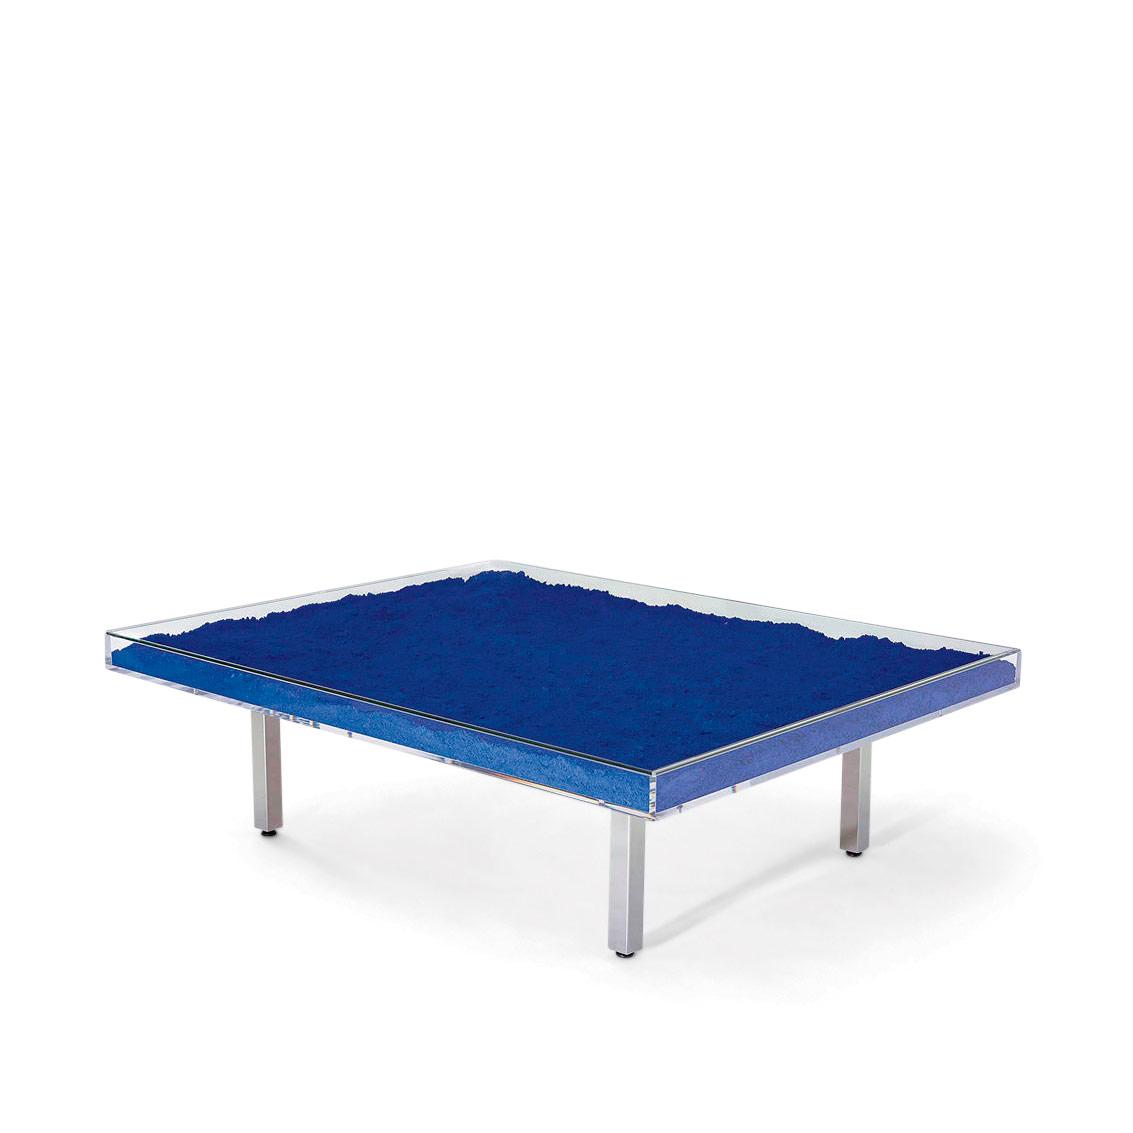 Table Bleue by Artist Yves Klein